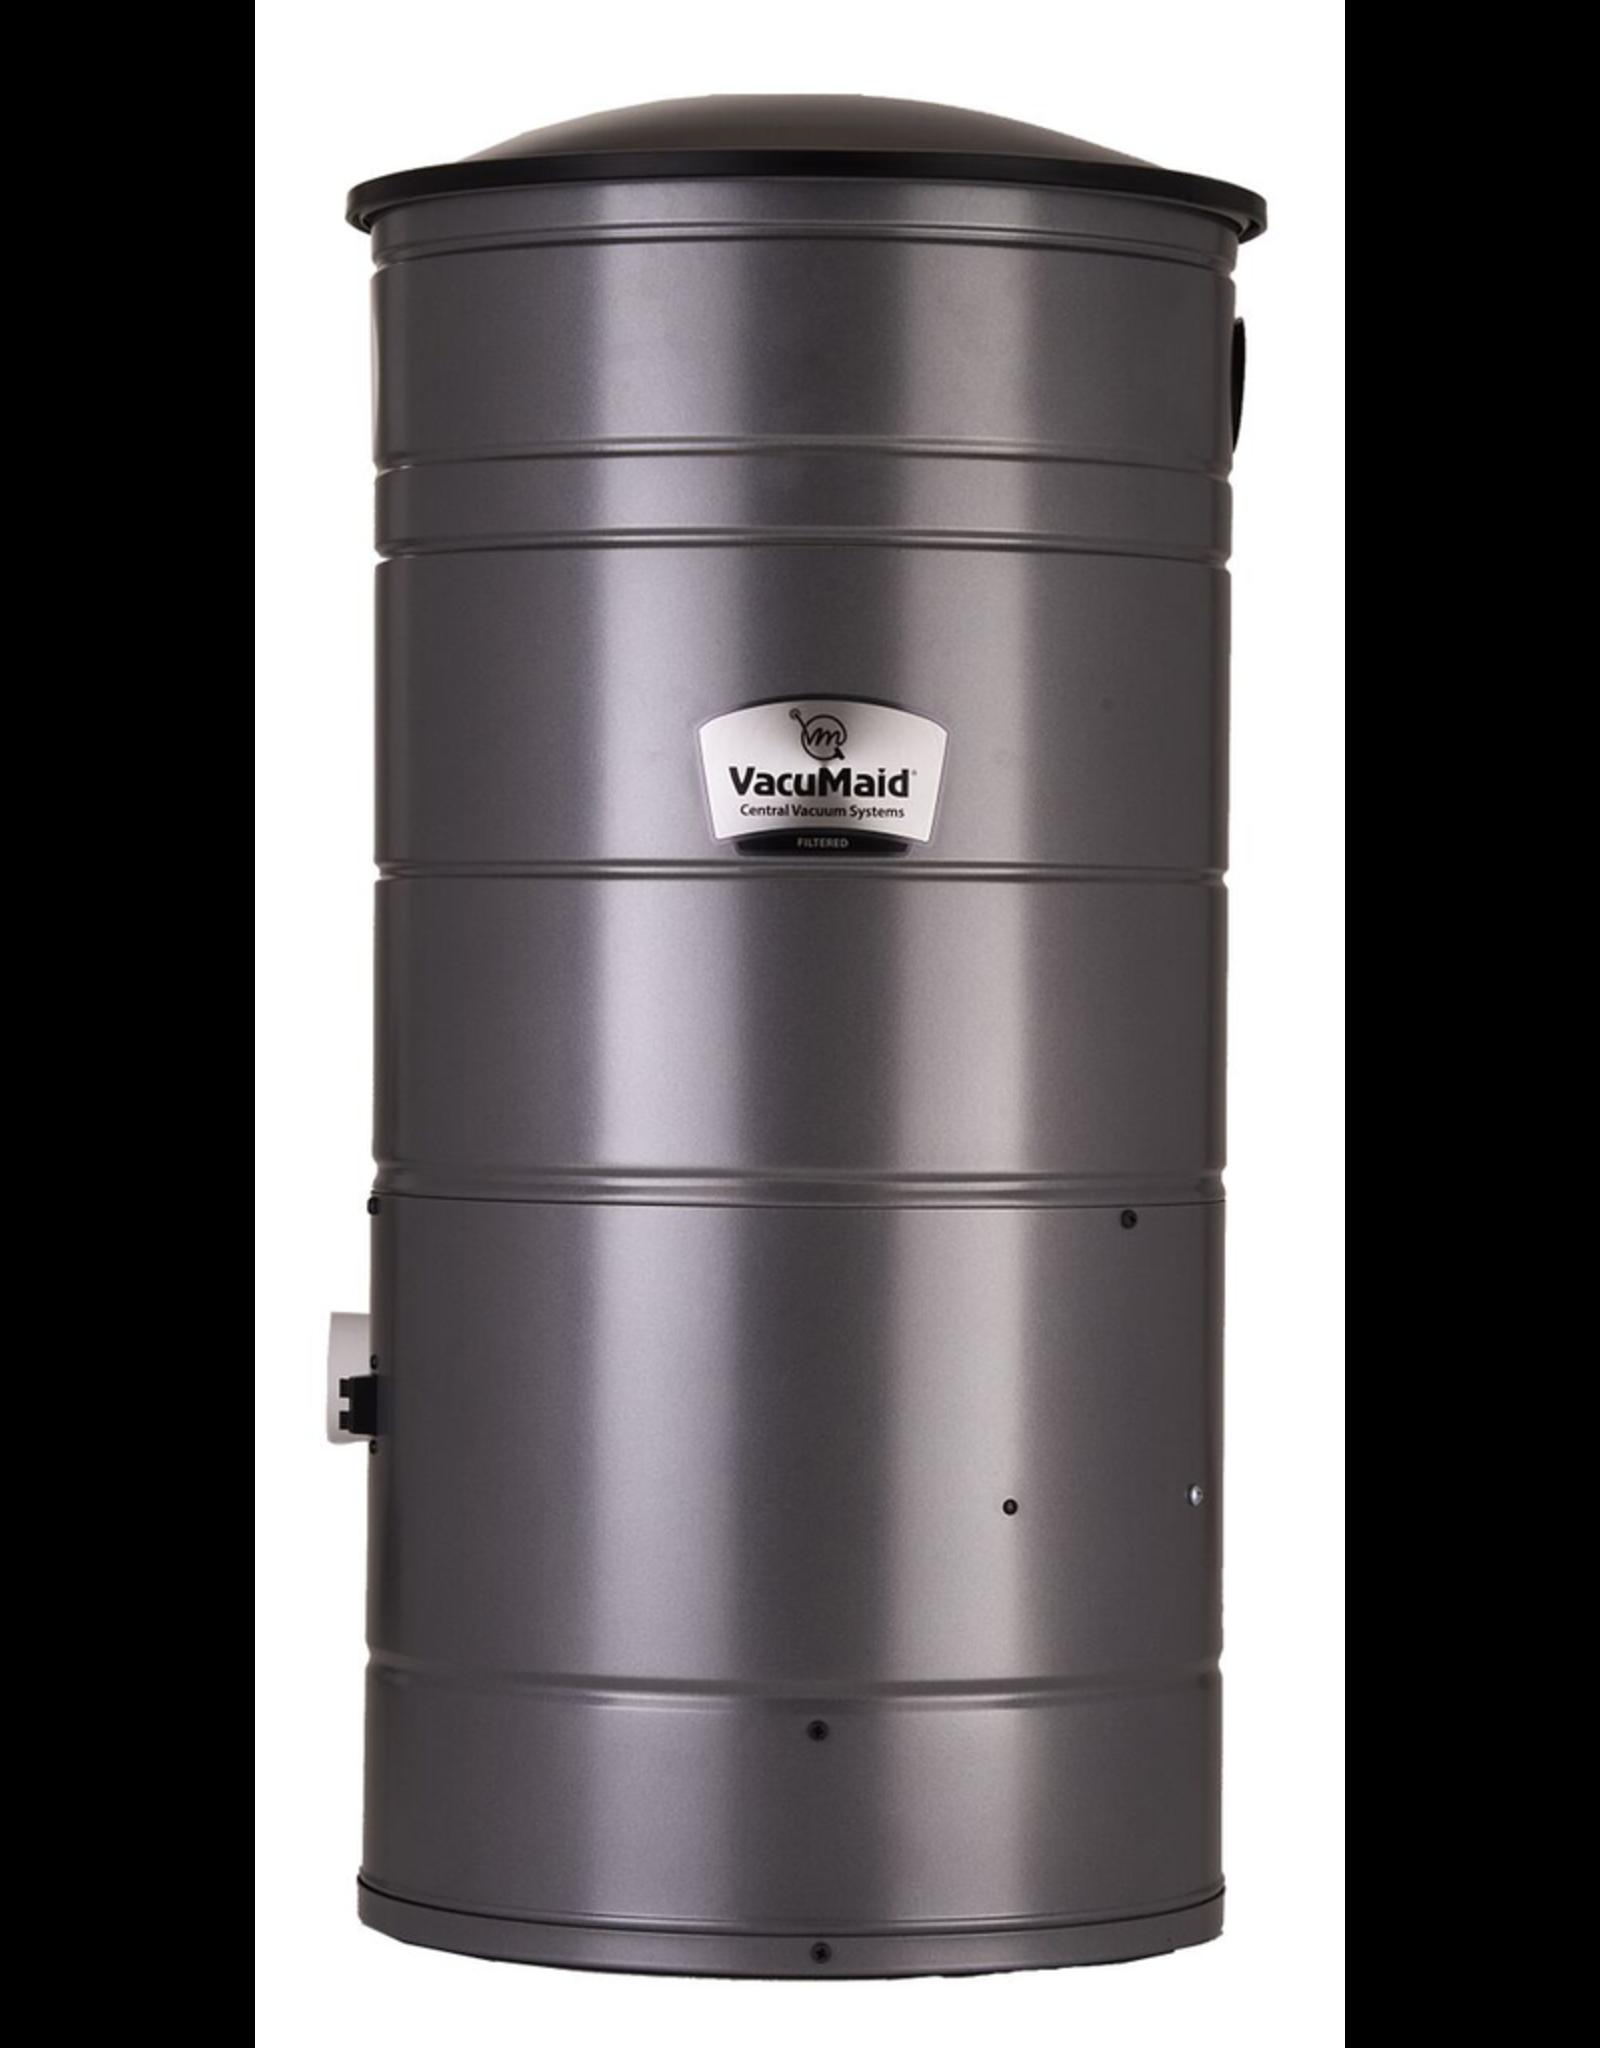 VacuMaid VacuMaid SR800 Power Unit with Disposable HEPA Bag